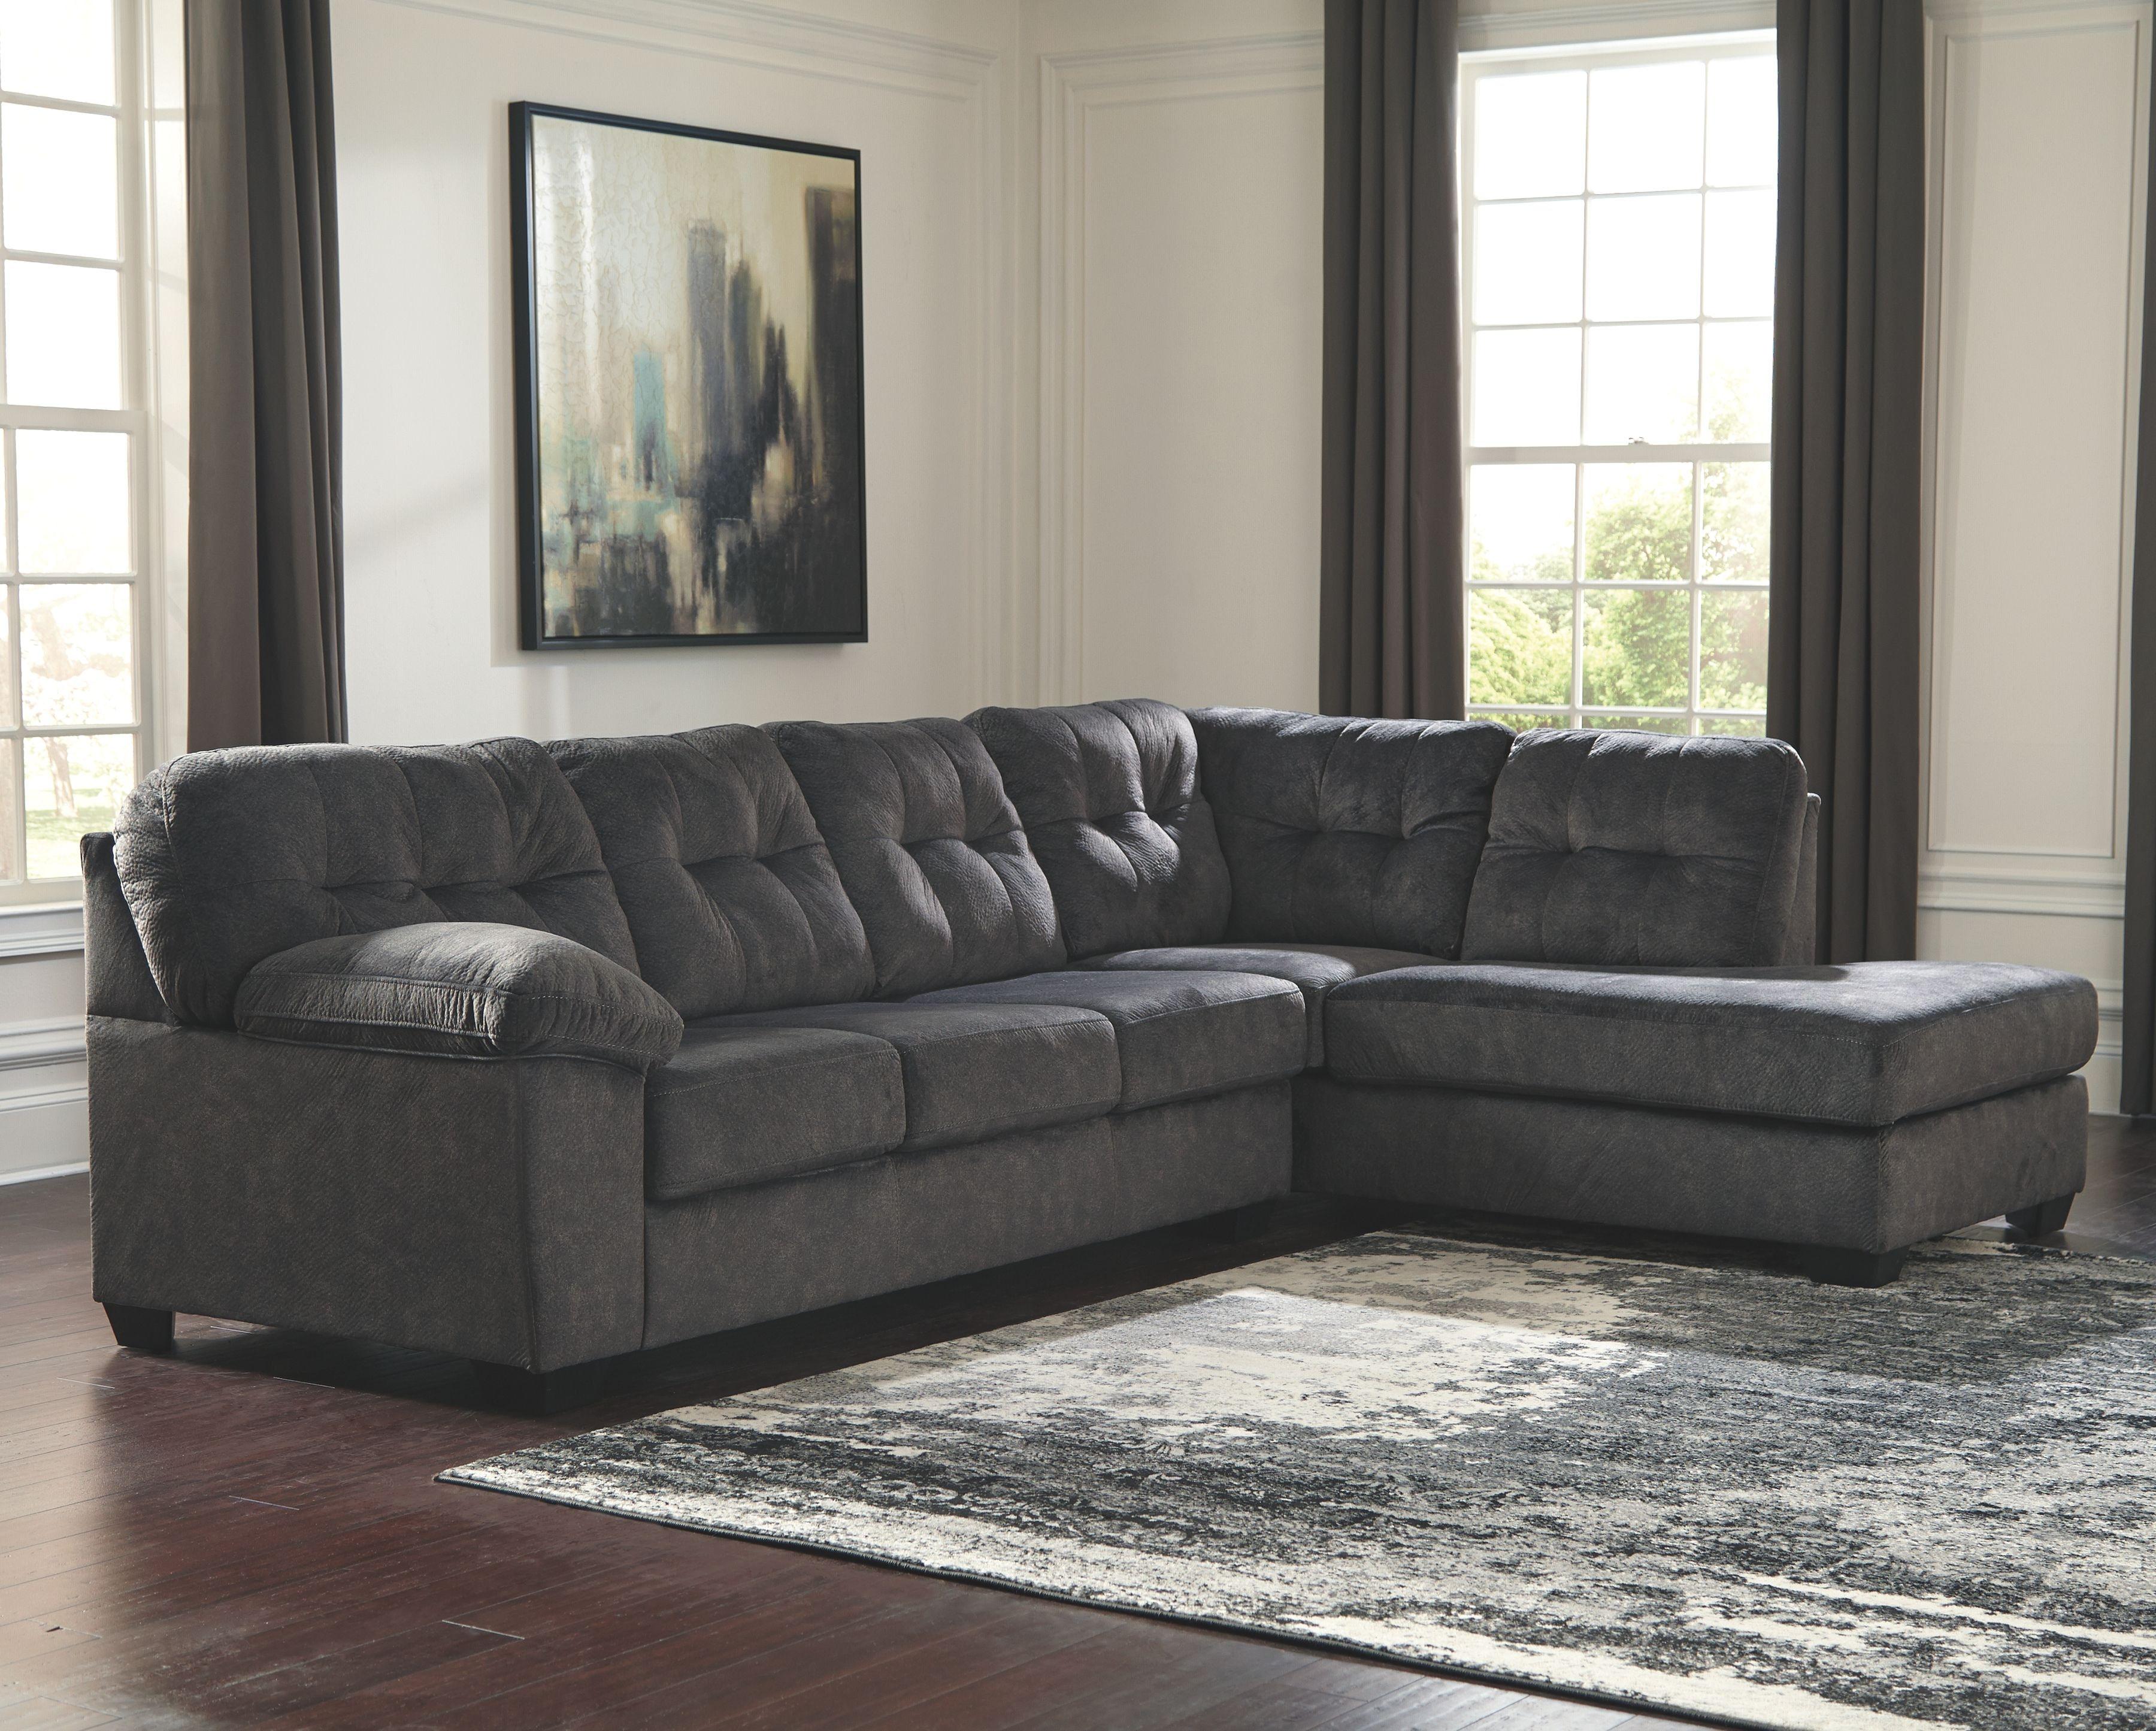 Signature Design By Ashley Living Room RAF Corner Chaise 7050917 At  Hunteru0027s Furniture